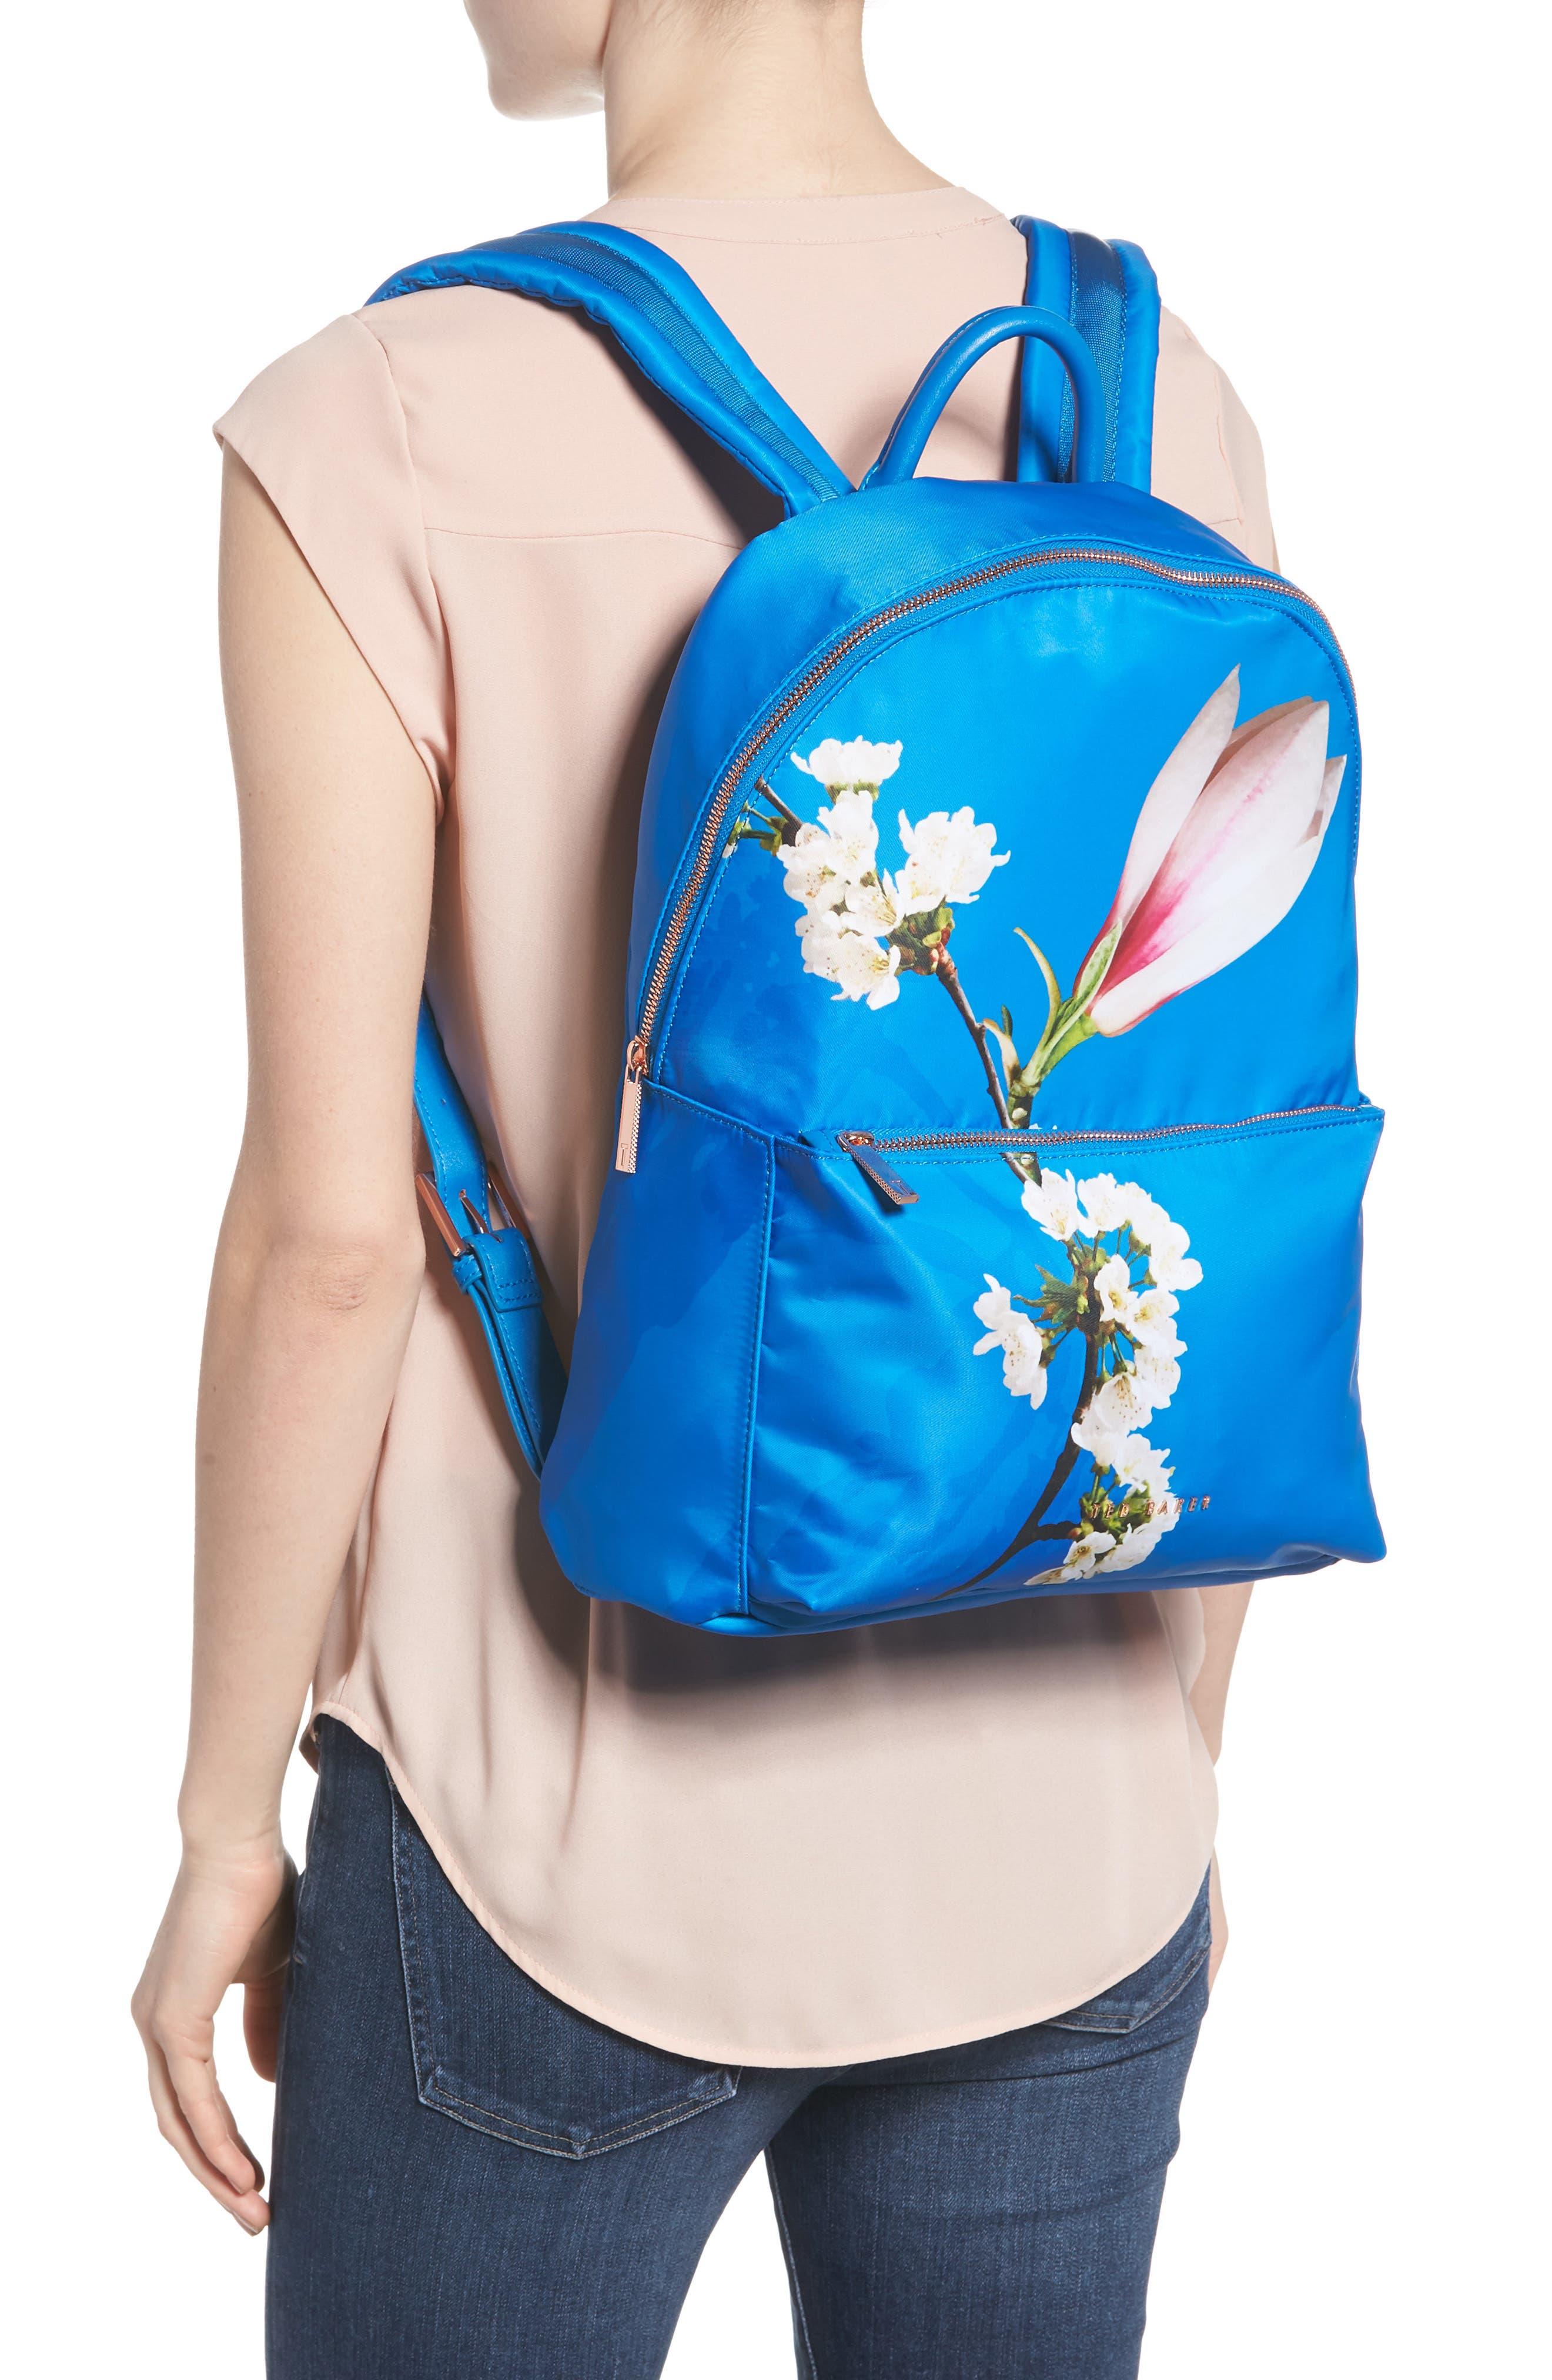 Harmony Print Backpack,                             Alternate thumbnail 2, color,                             Bright Blue